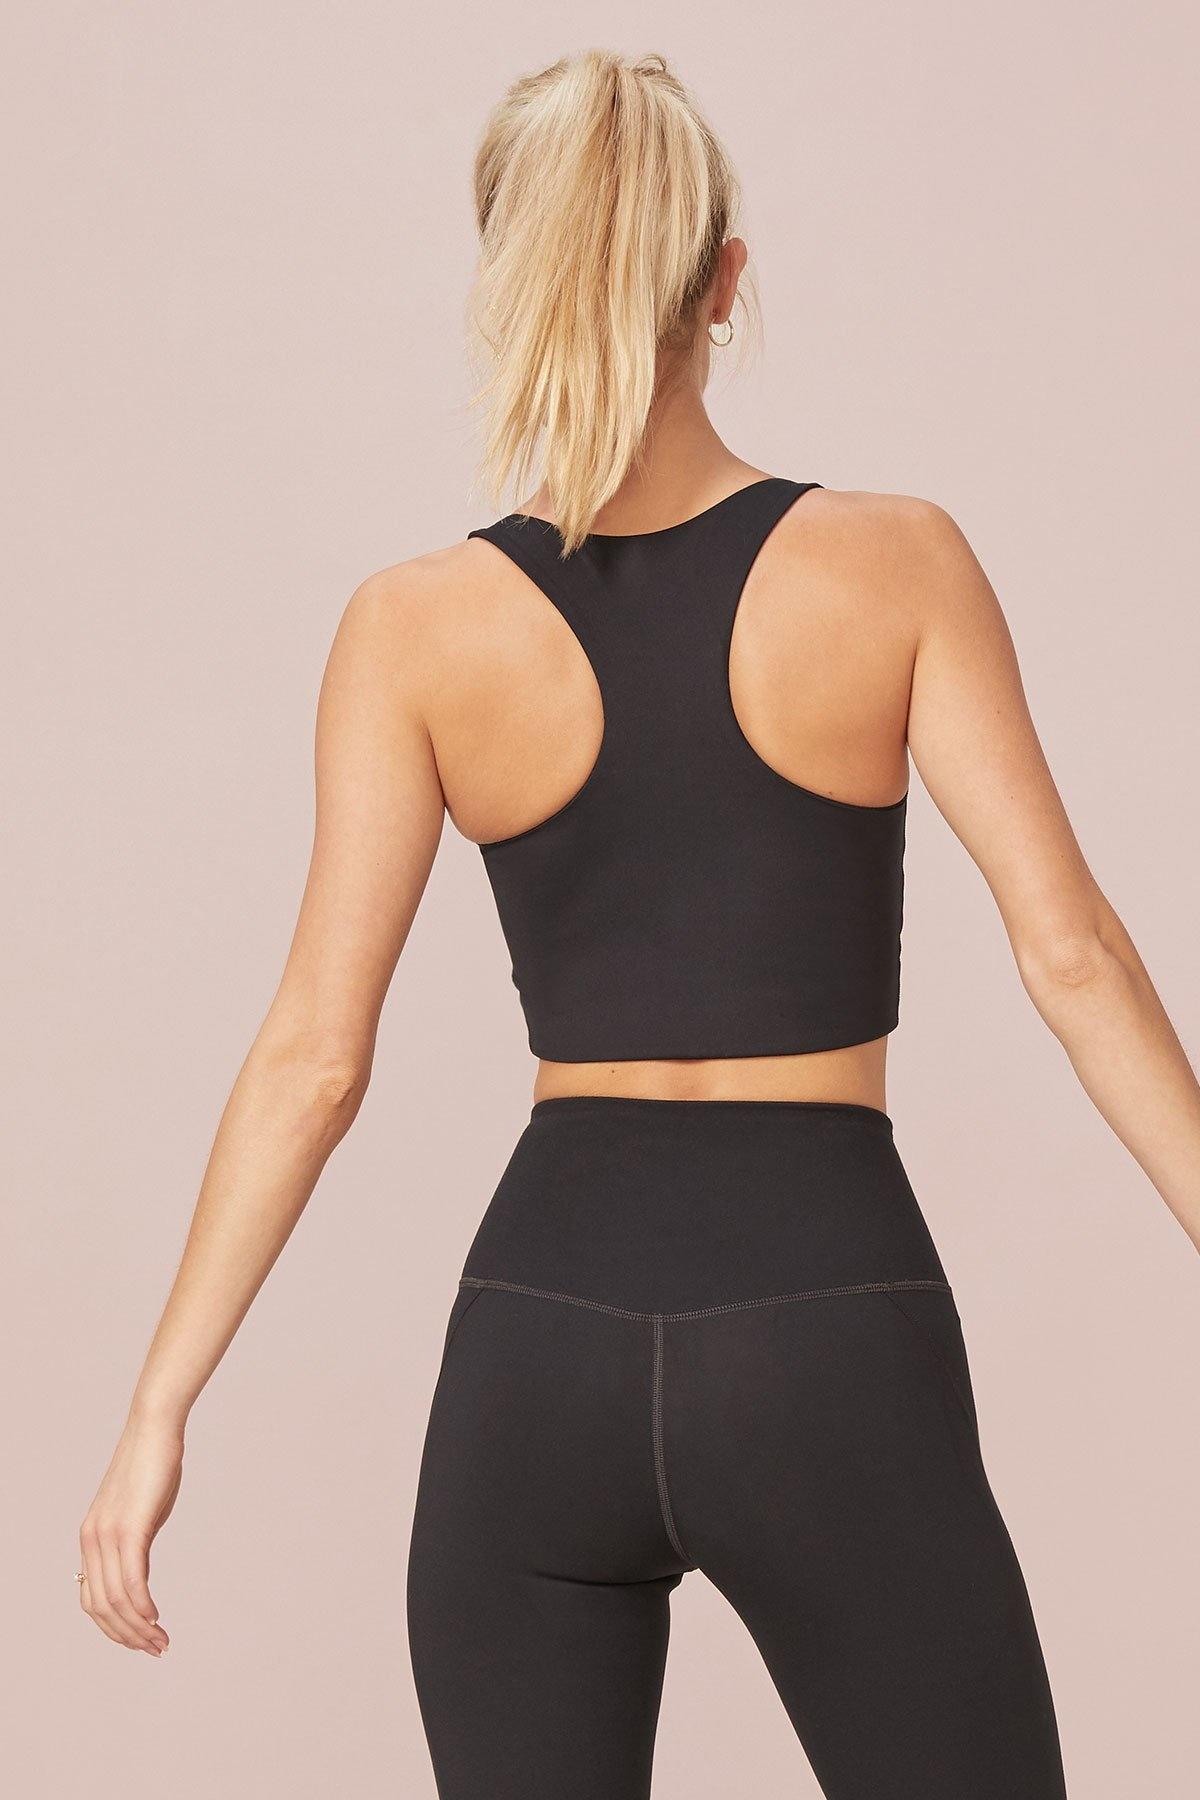 Girlfriend Collective | Paloma sports bra black-5